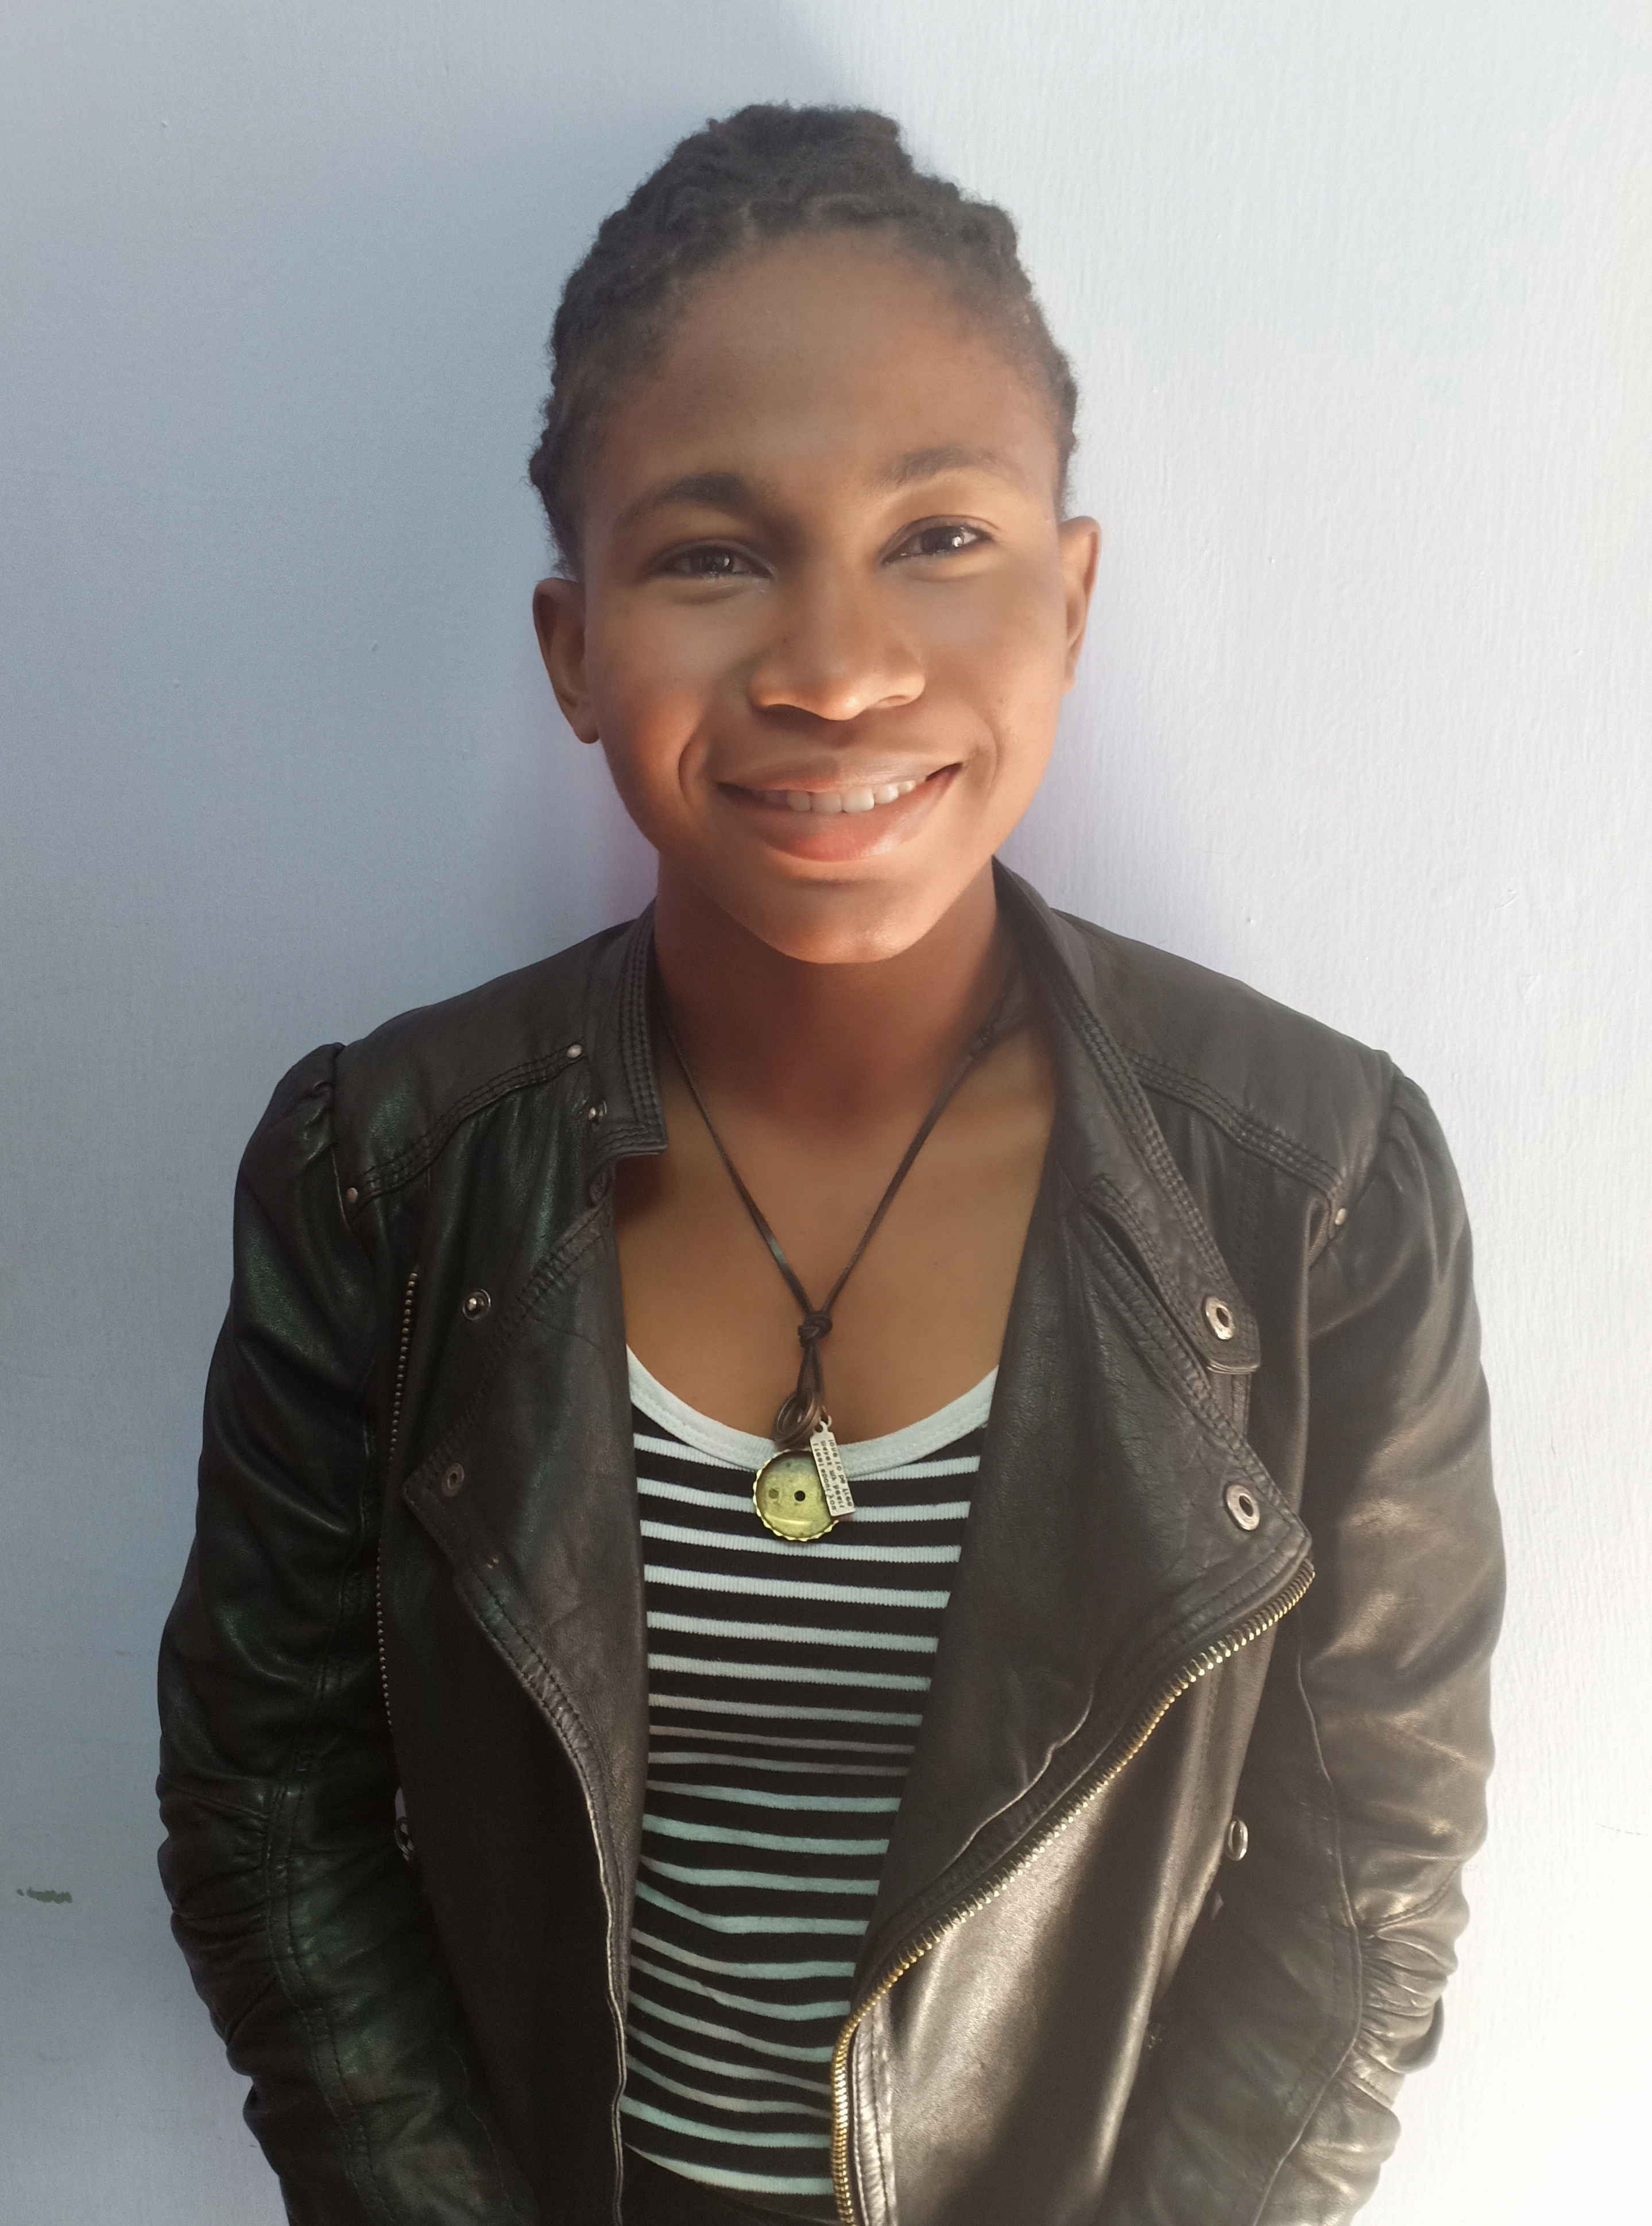 About Abigail Nwaocha